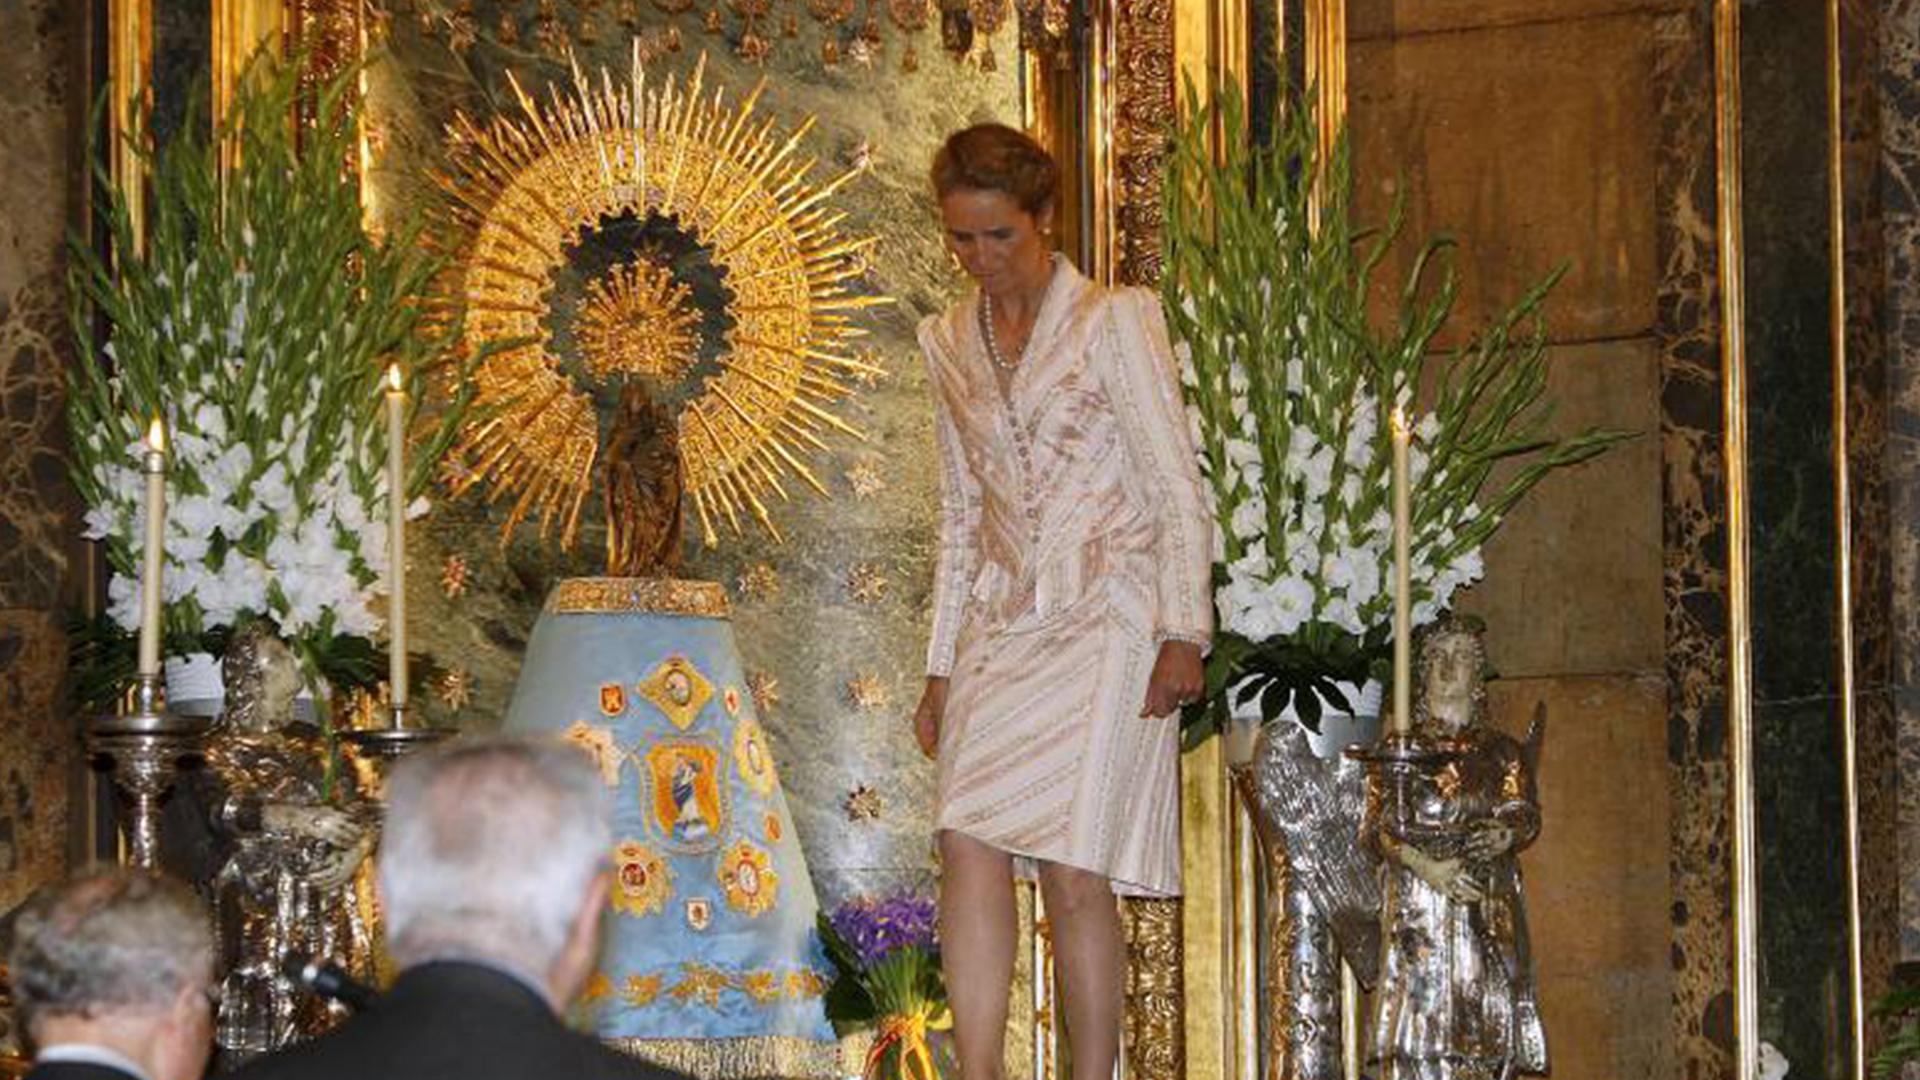 RMCZ visita Infanta Elena 2014 02